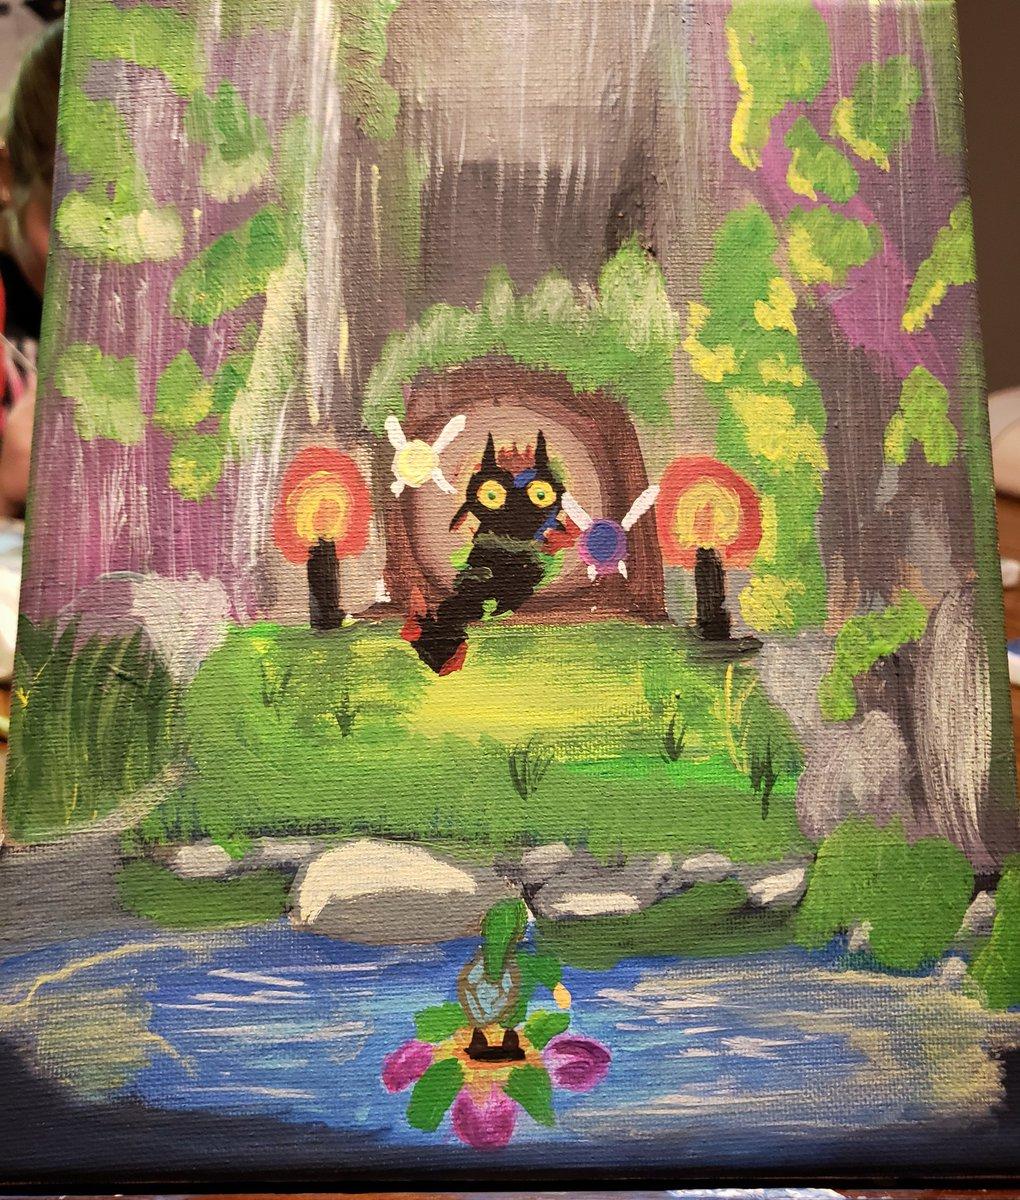 Paint night!  Majora's Mask. #loz #ArtistOnTwitter #gamingart #Nintendopic.twitter.com/ZMjey82y0D